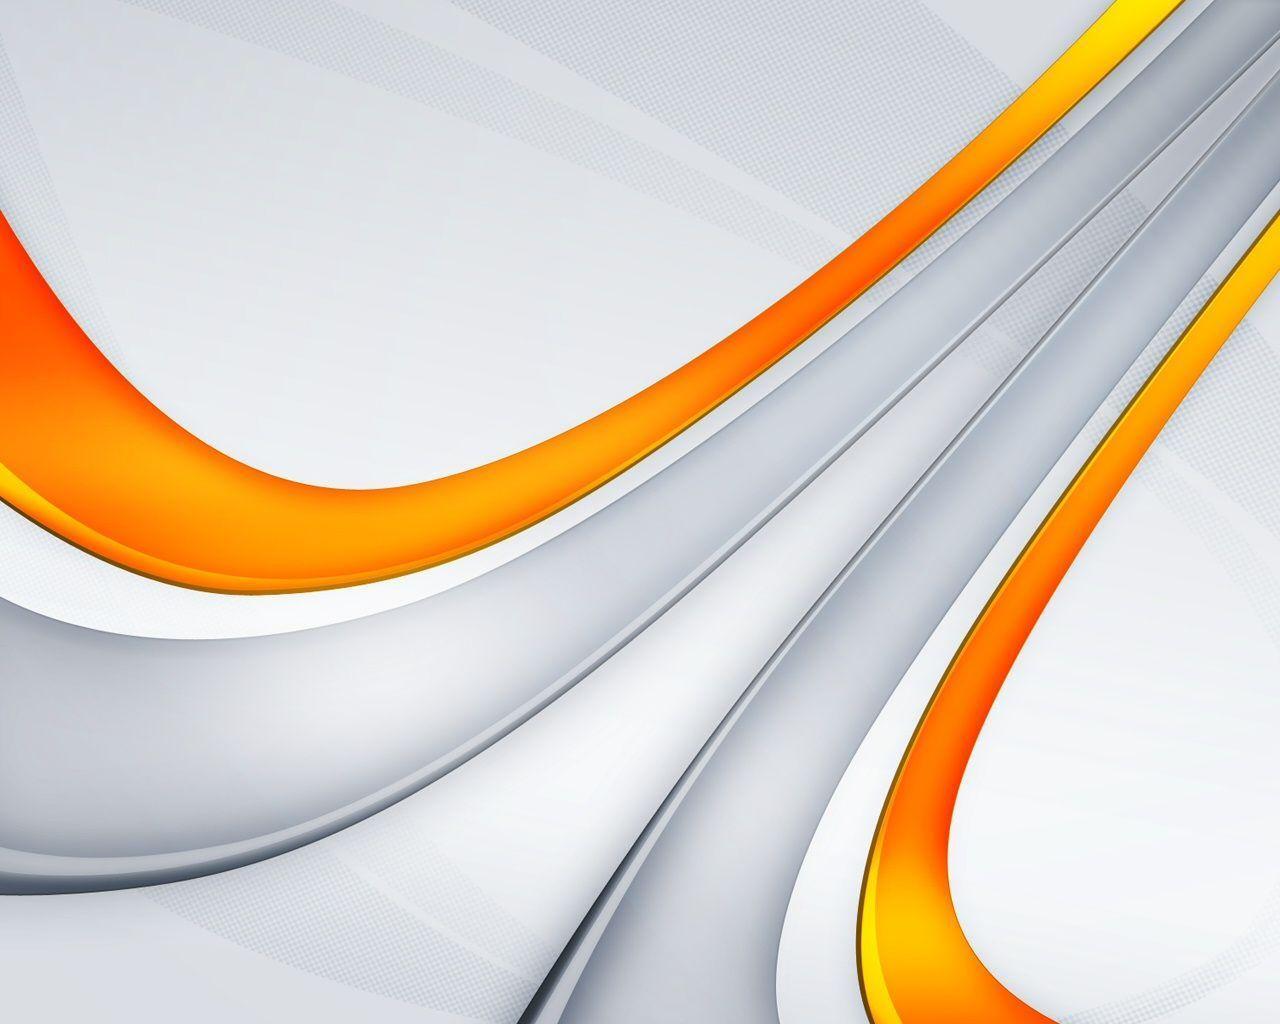 Orange Abstract Desktop Wallpapers Top Free Orange